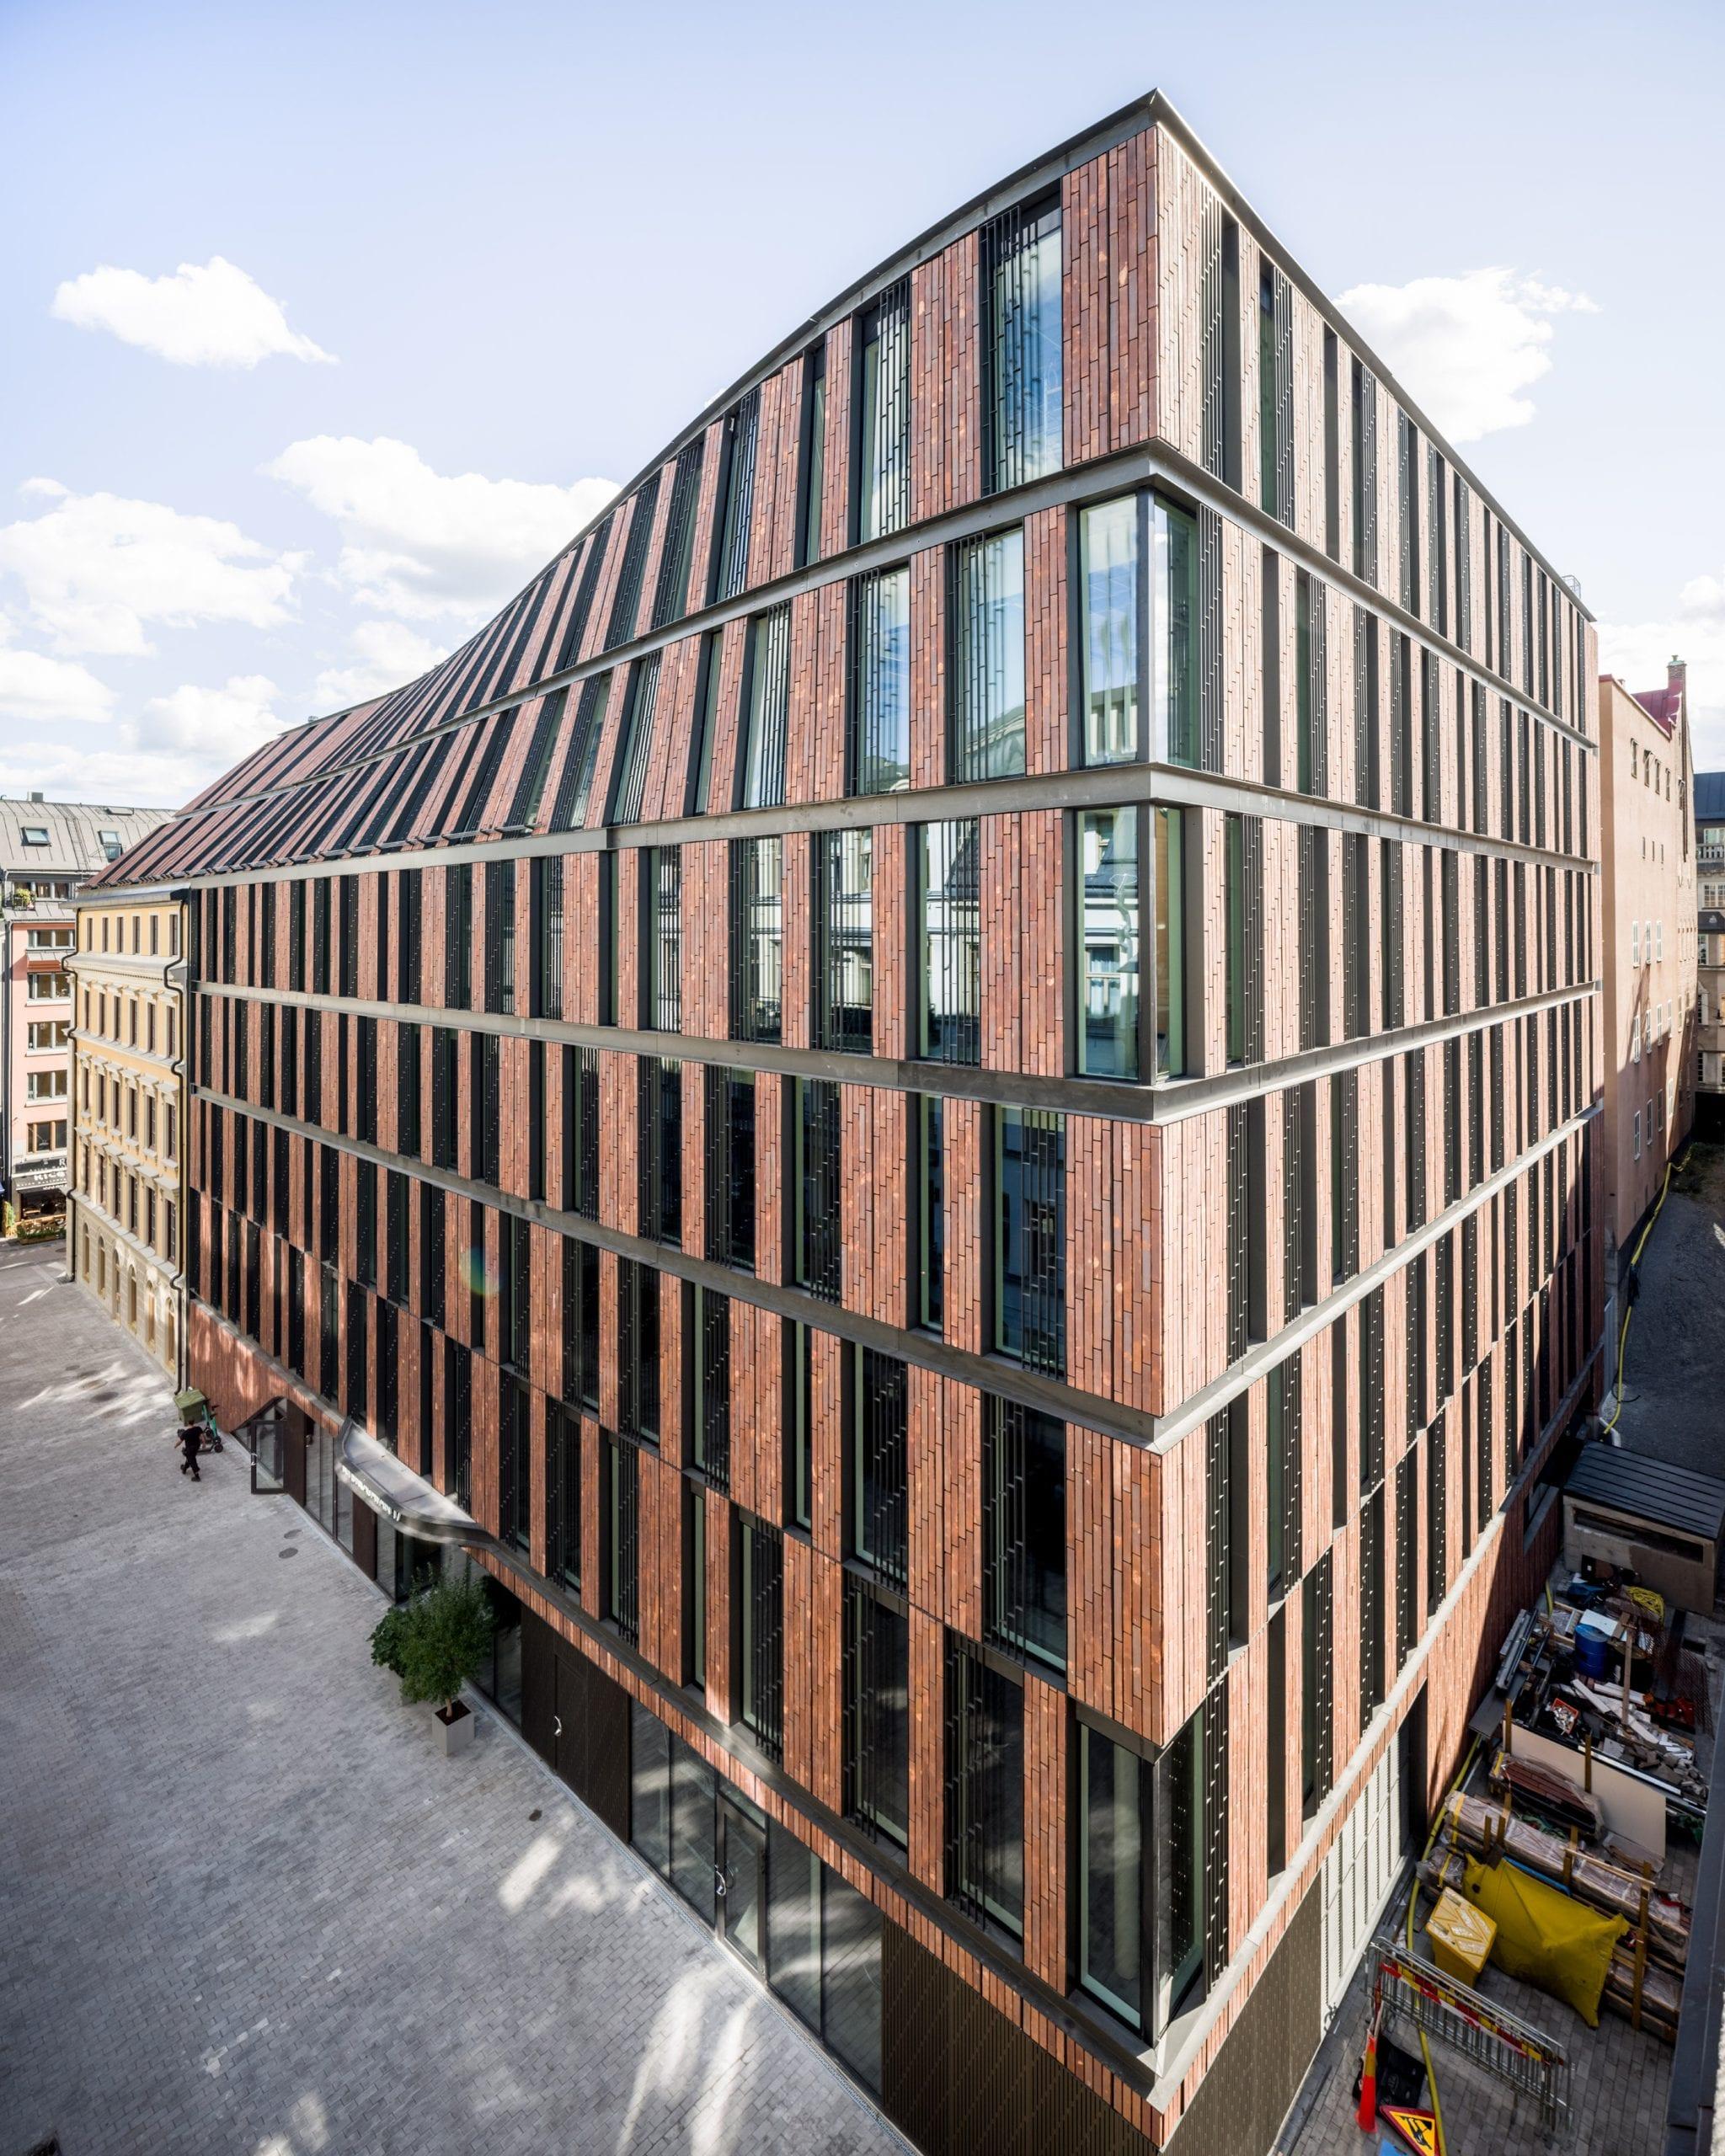 The Nybrogatan 17 office block is located on a corner plot